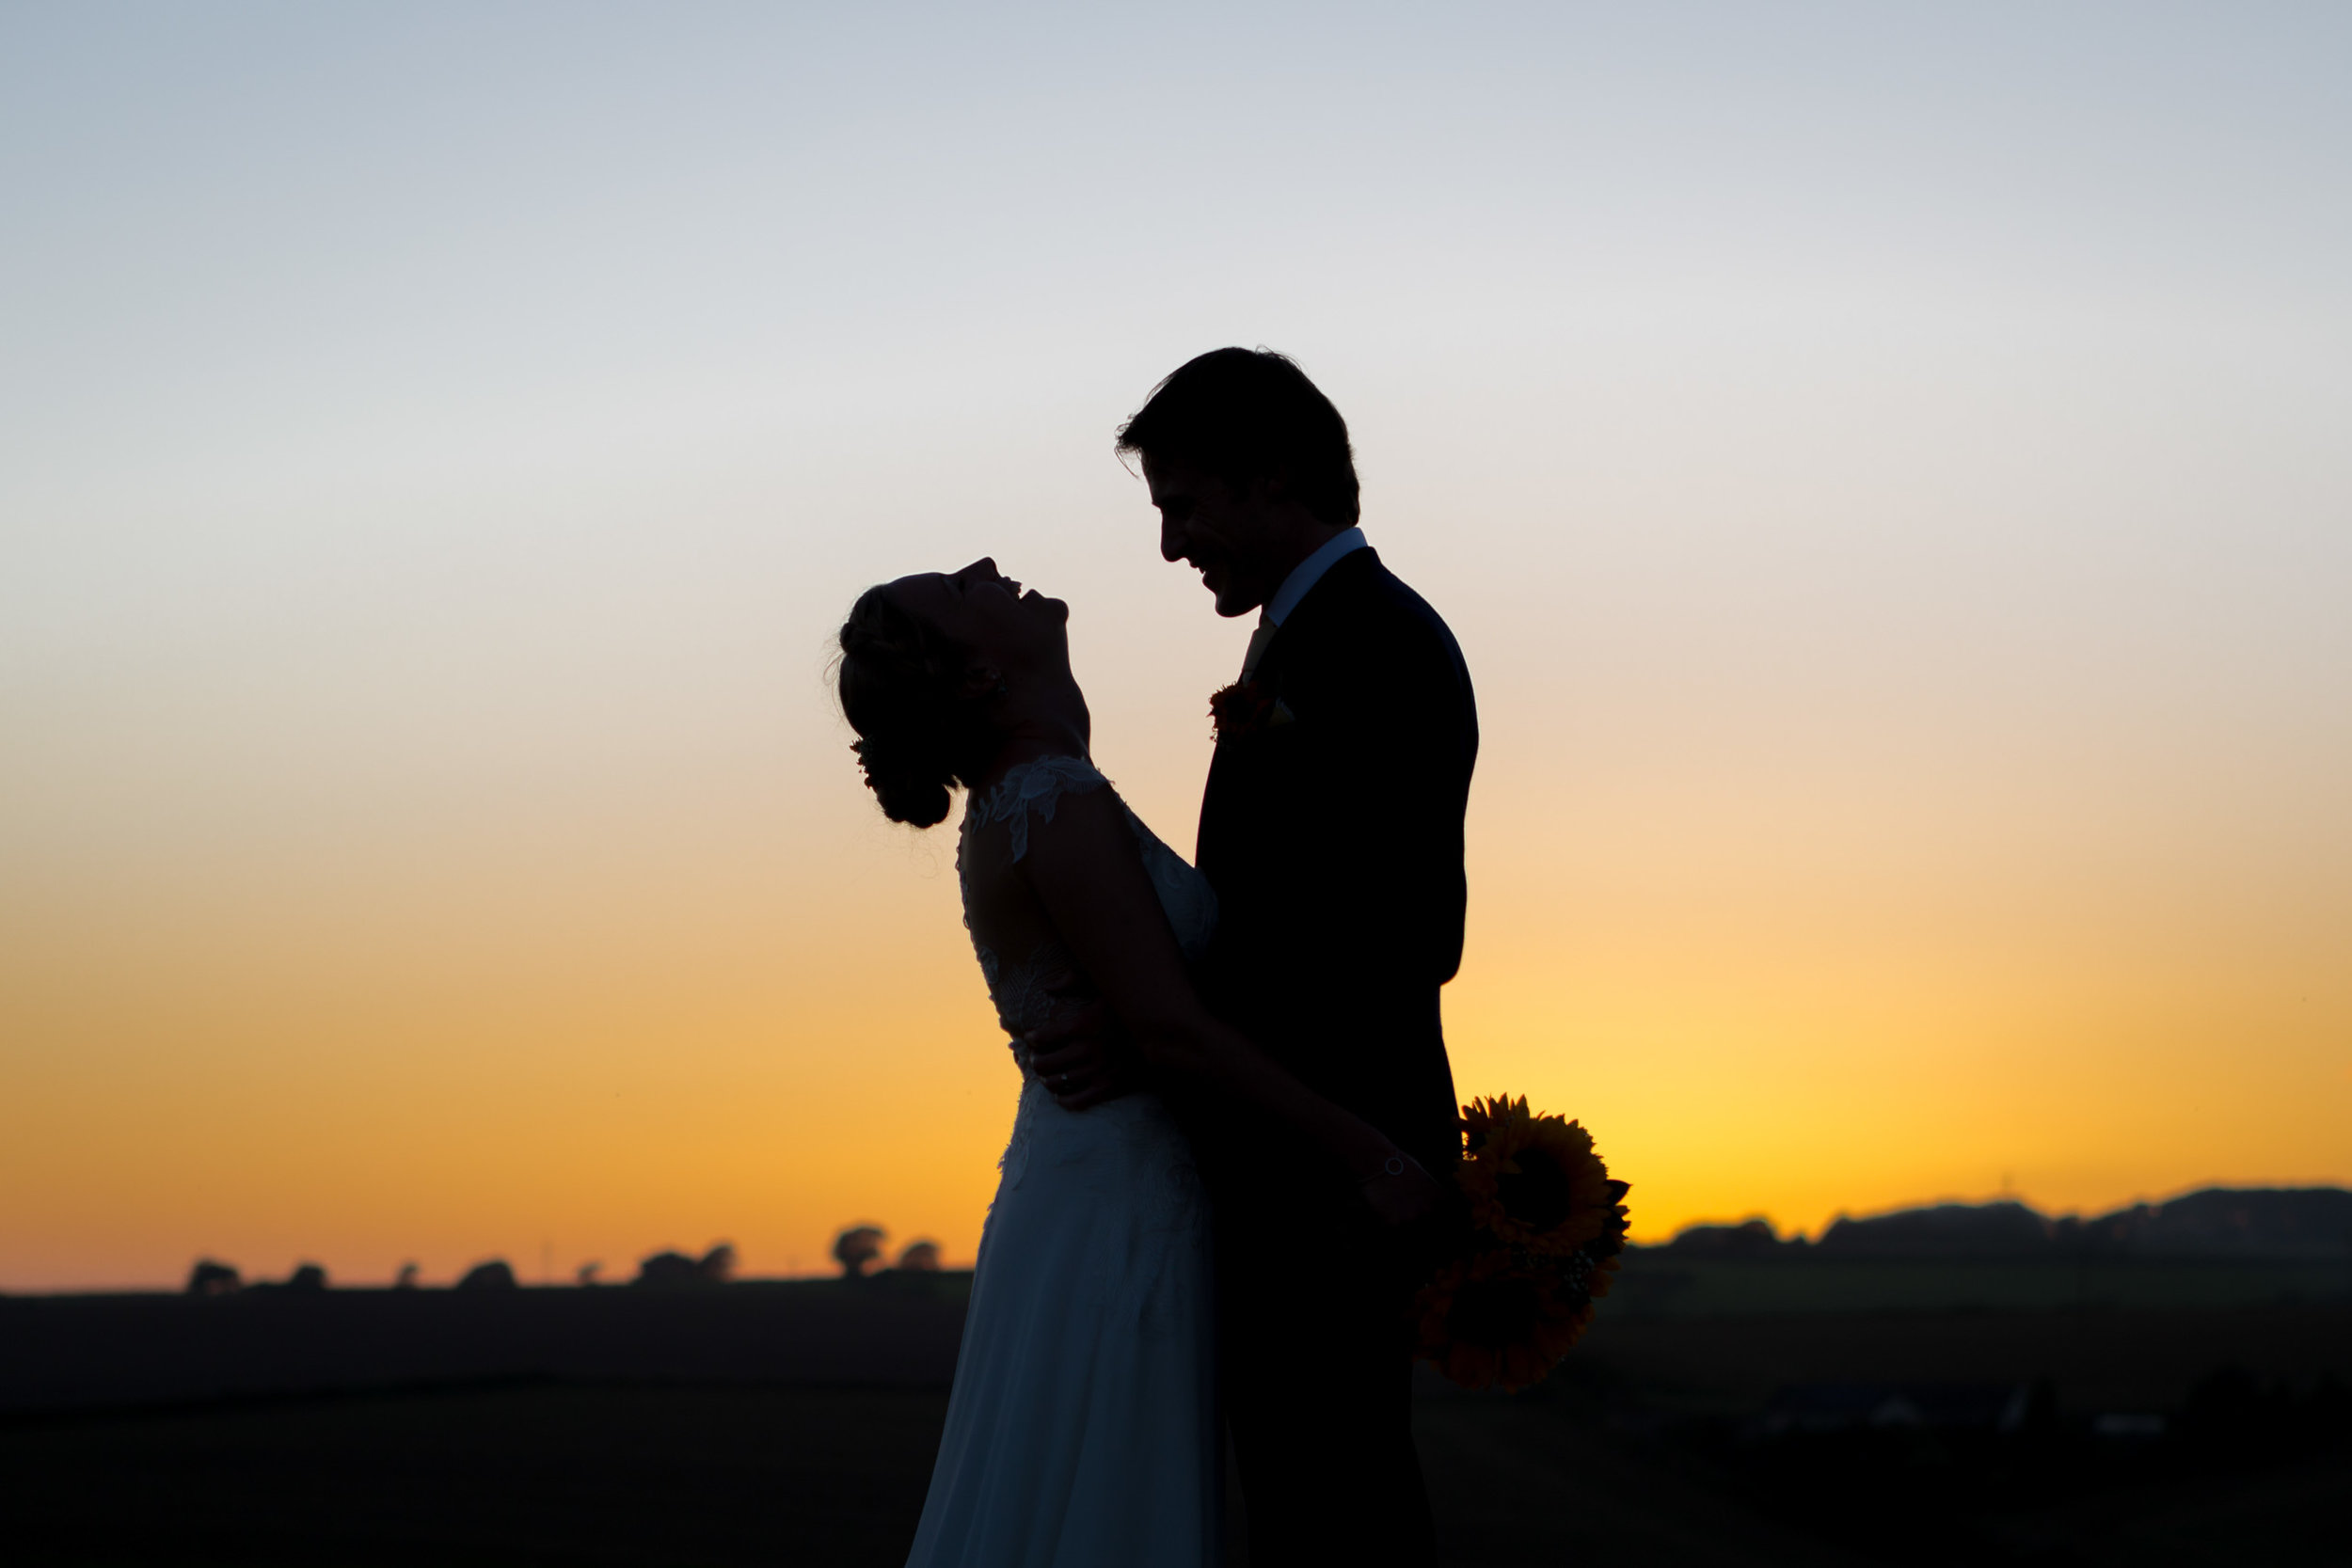 Bucklands-Tout-Saints-Hotel-Devon-Wedding-Photography-37.jpg